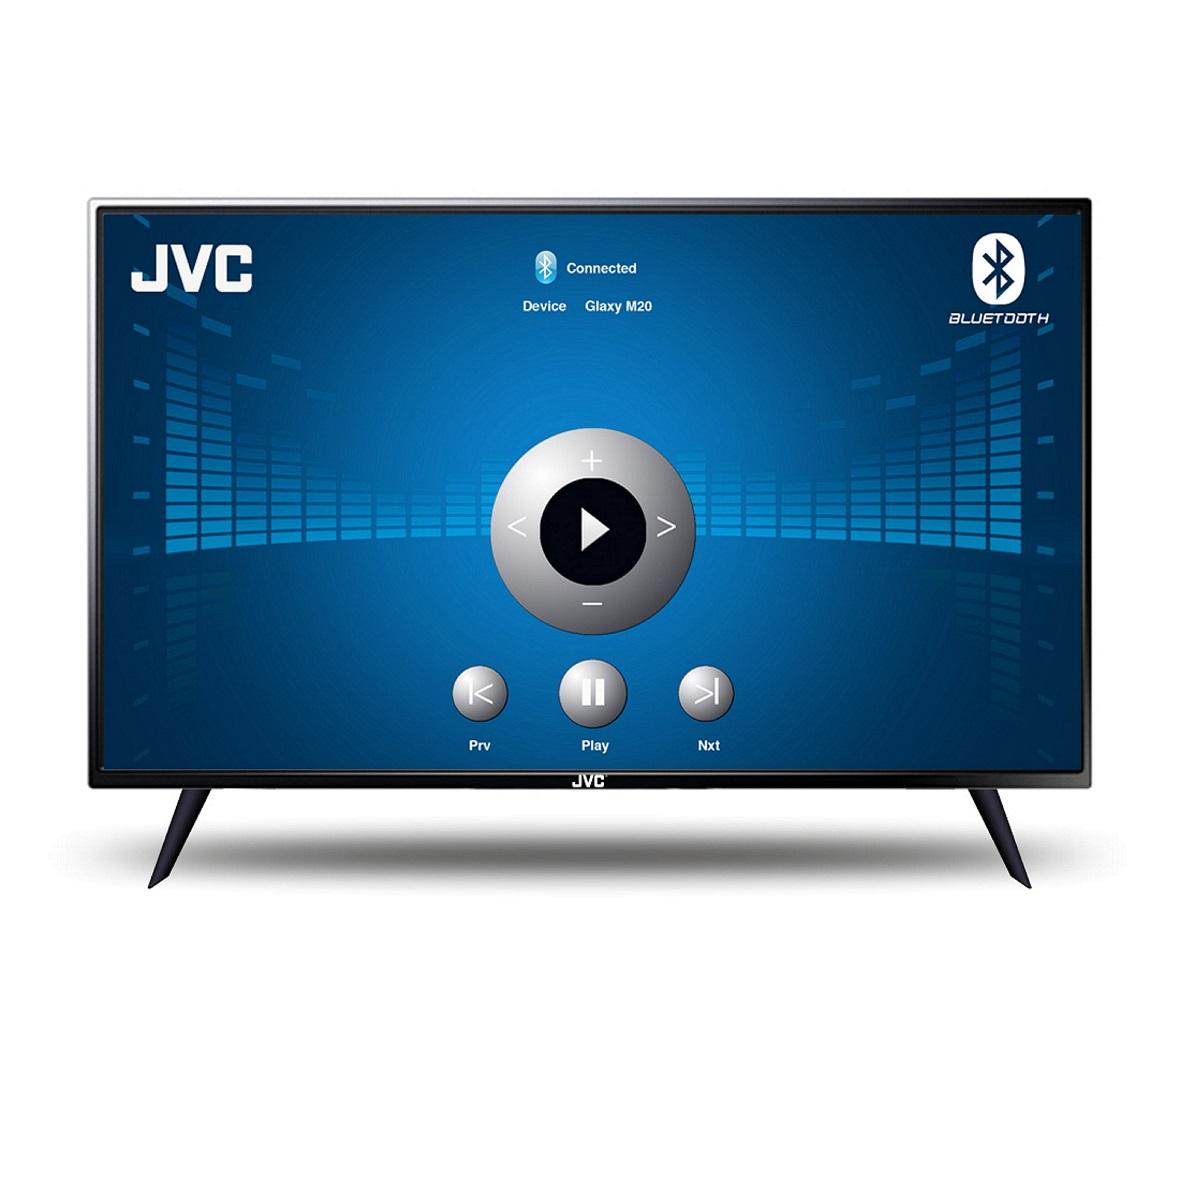 JVC_32N380C